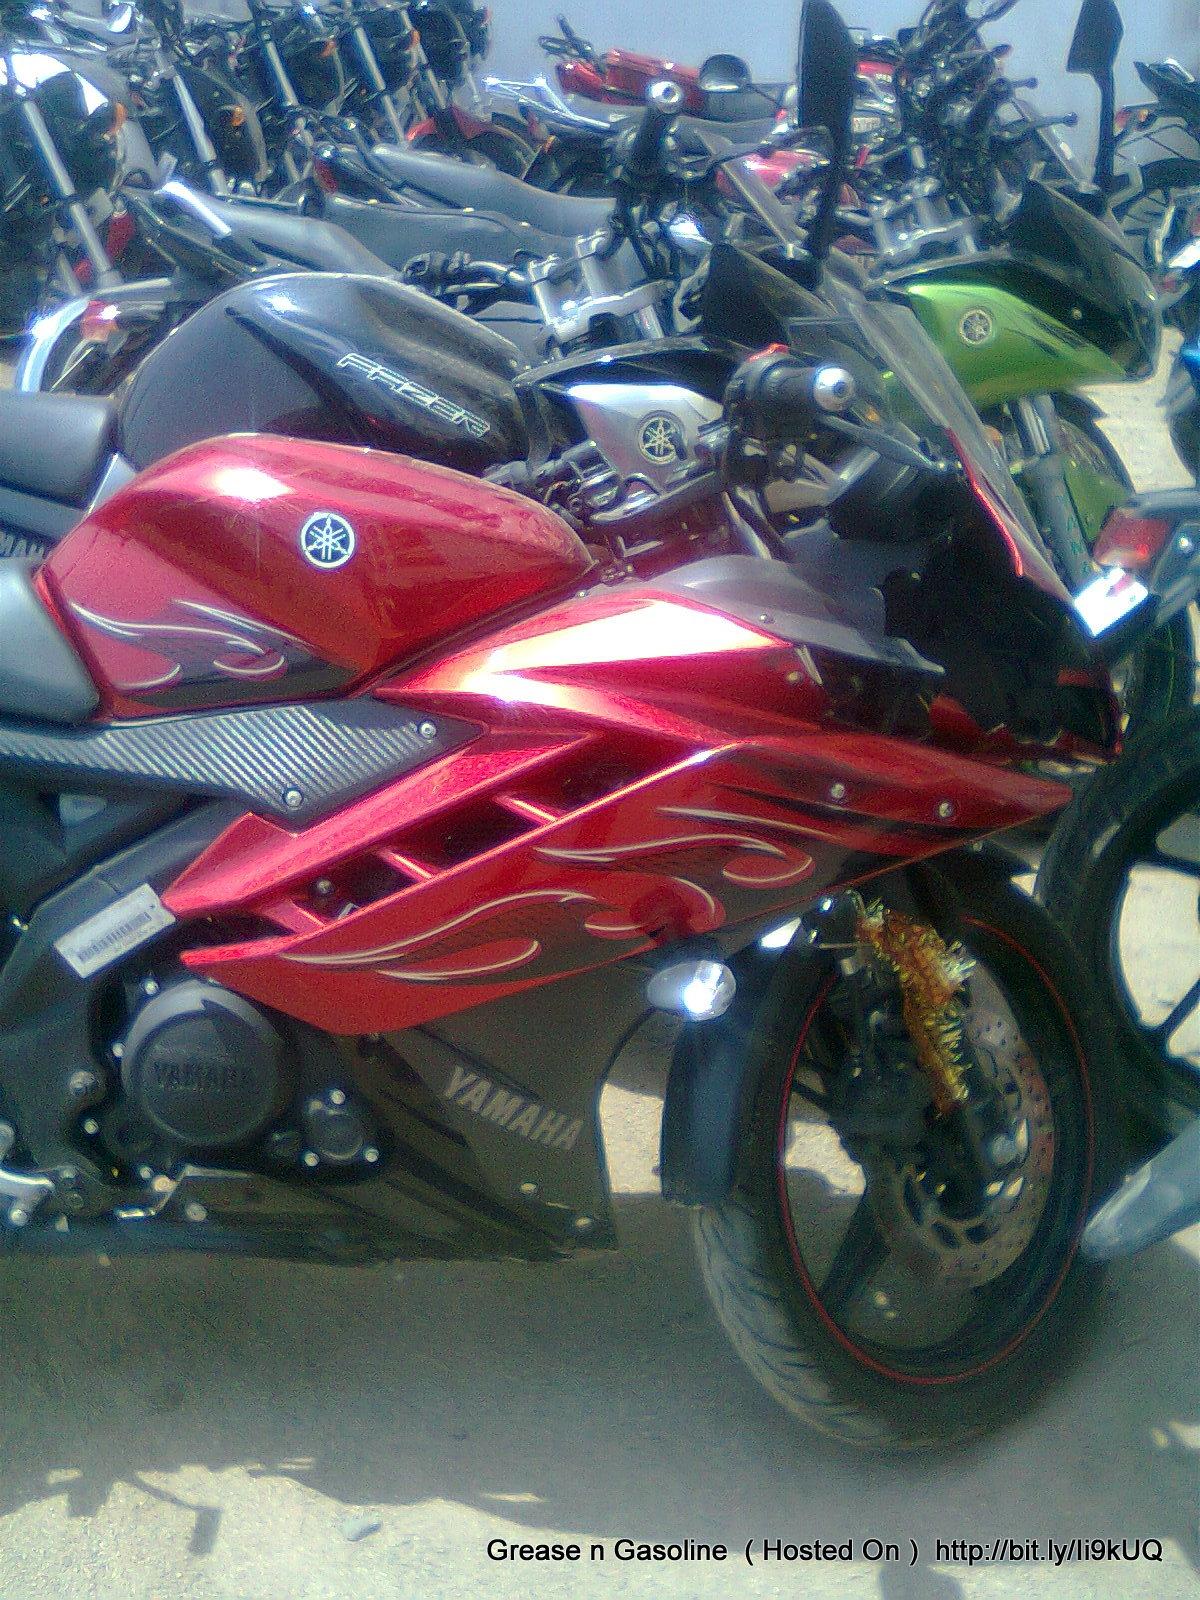 Yamaha R15 Price in India 2012 2012 Yamaha R15 v 2.0 Limited